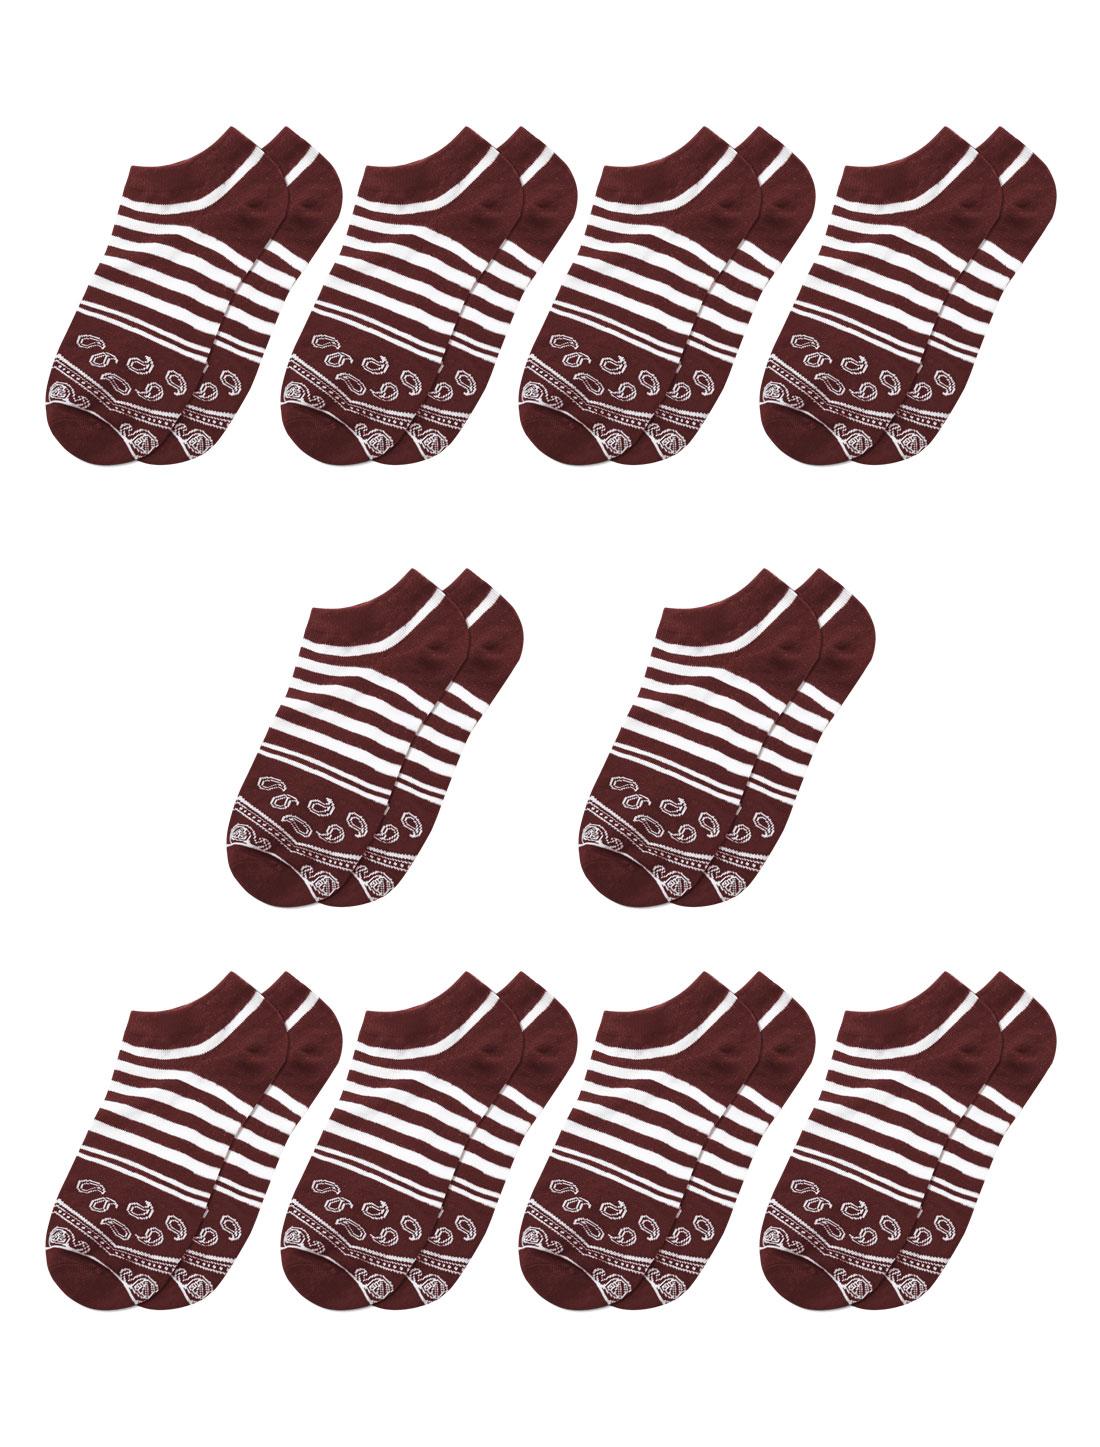 Men Stripes Paisleys Pattern Low Cut Short Socks 10 Pairs Red M